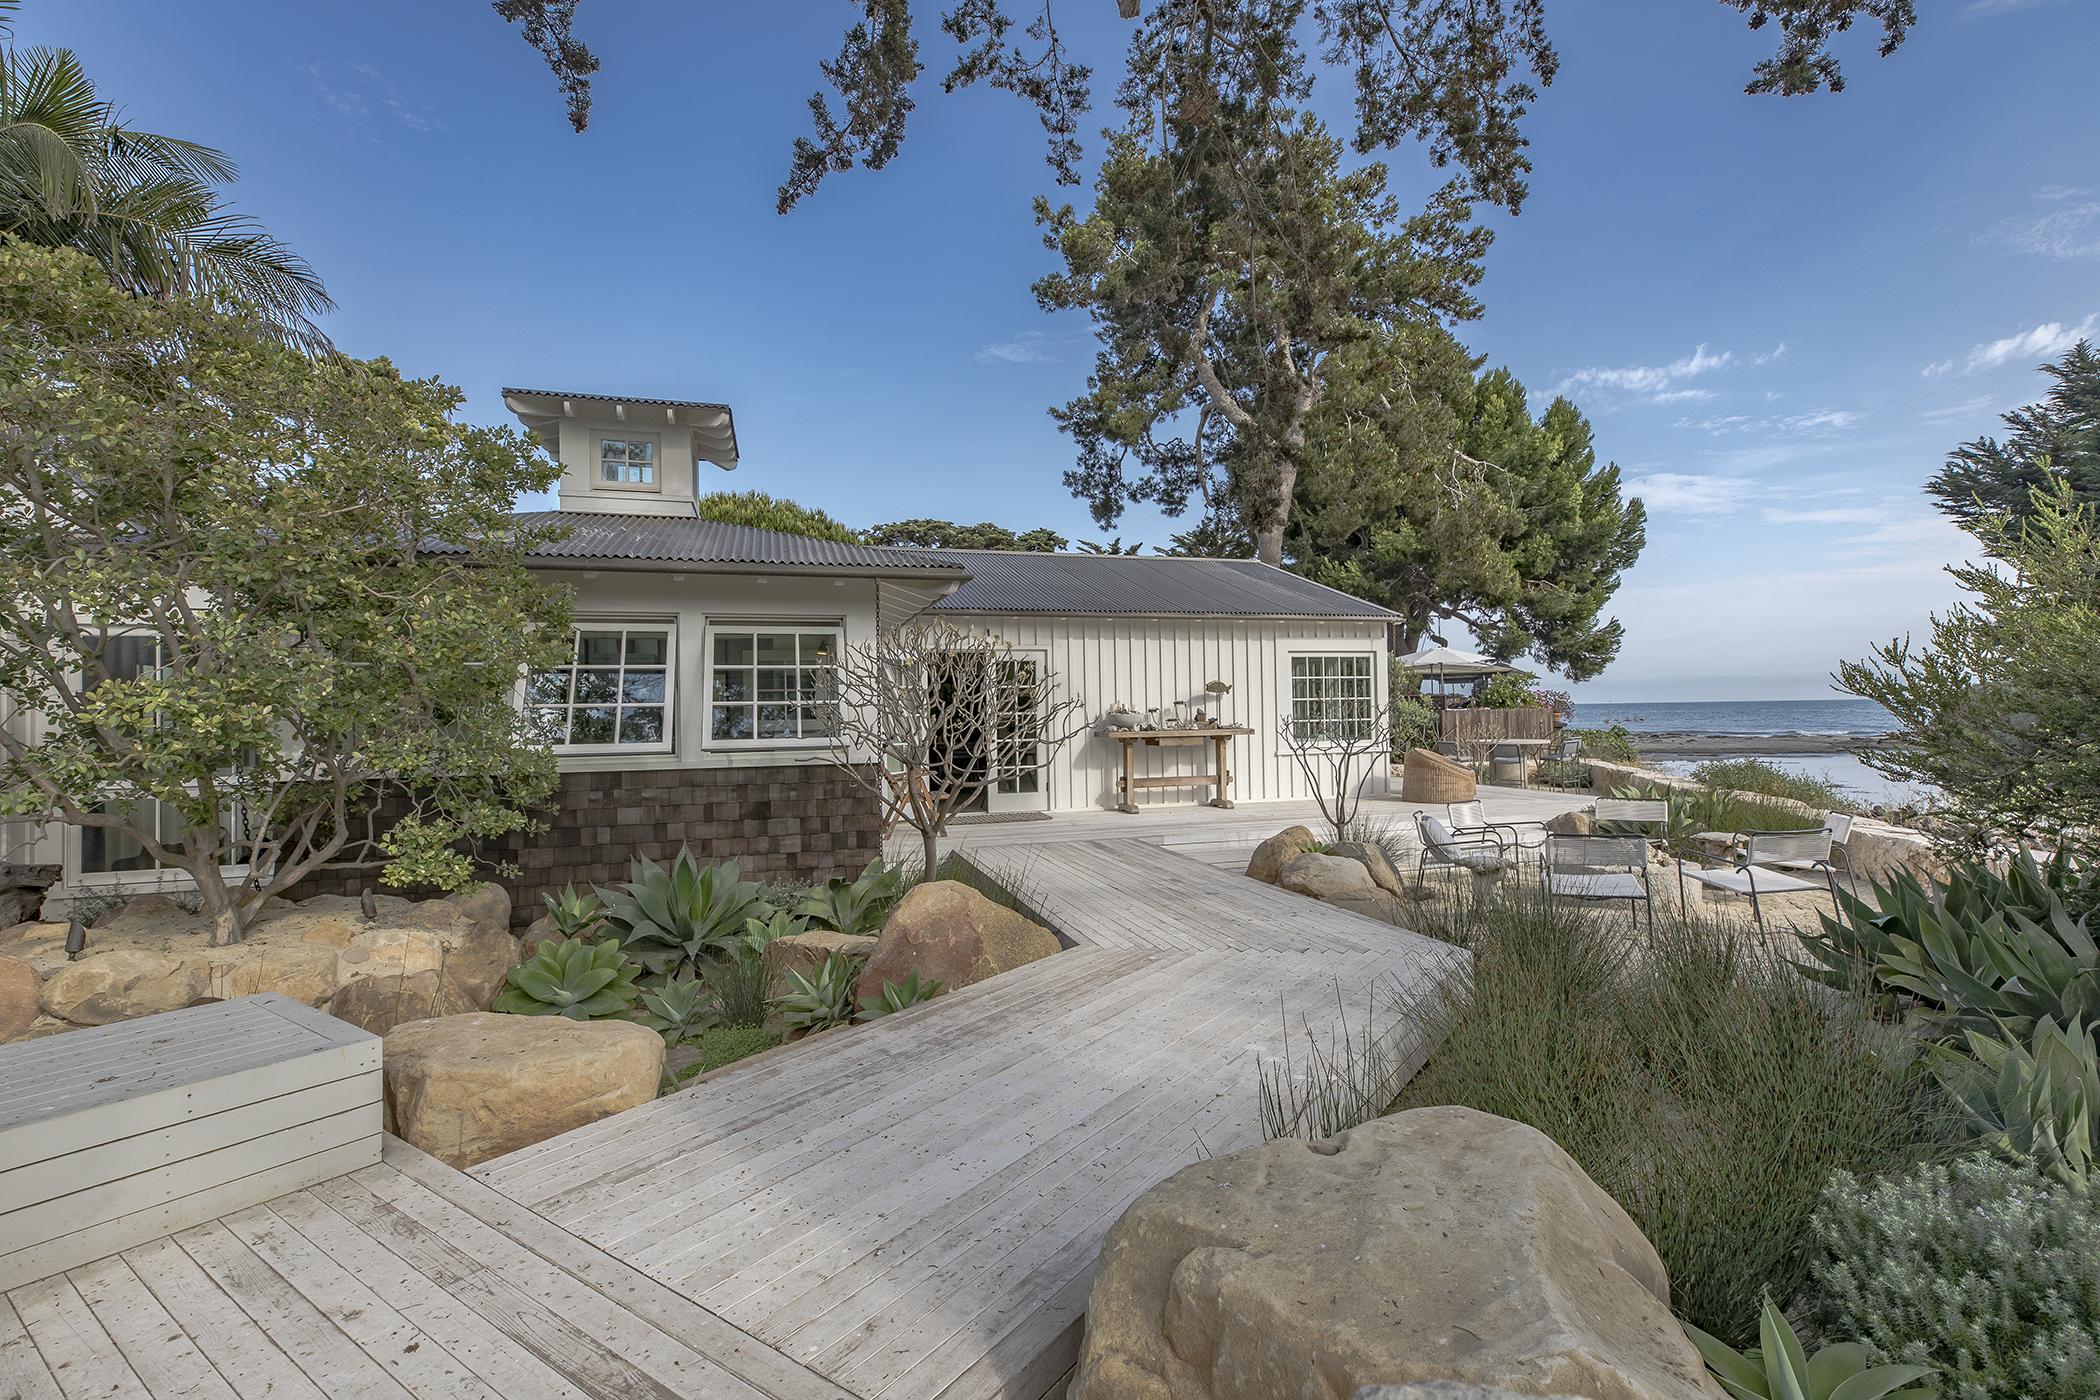 Contemporary California Surf Shack | CJ Paone AIA | Ventura CA Architect